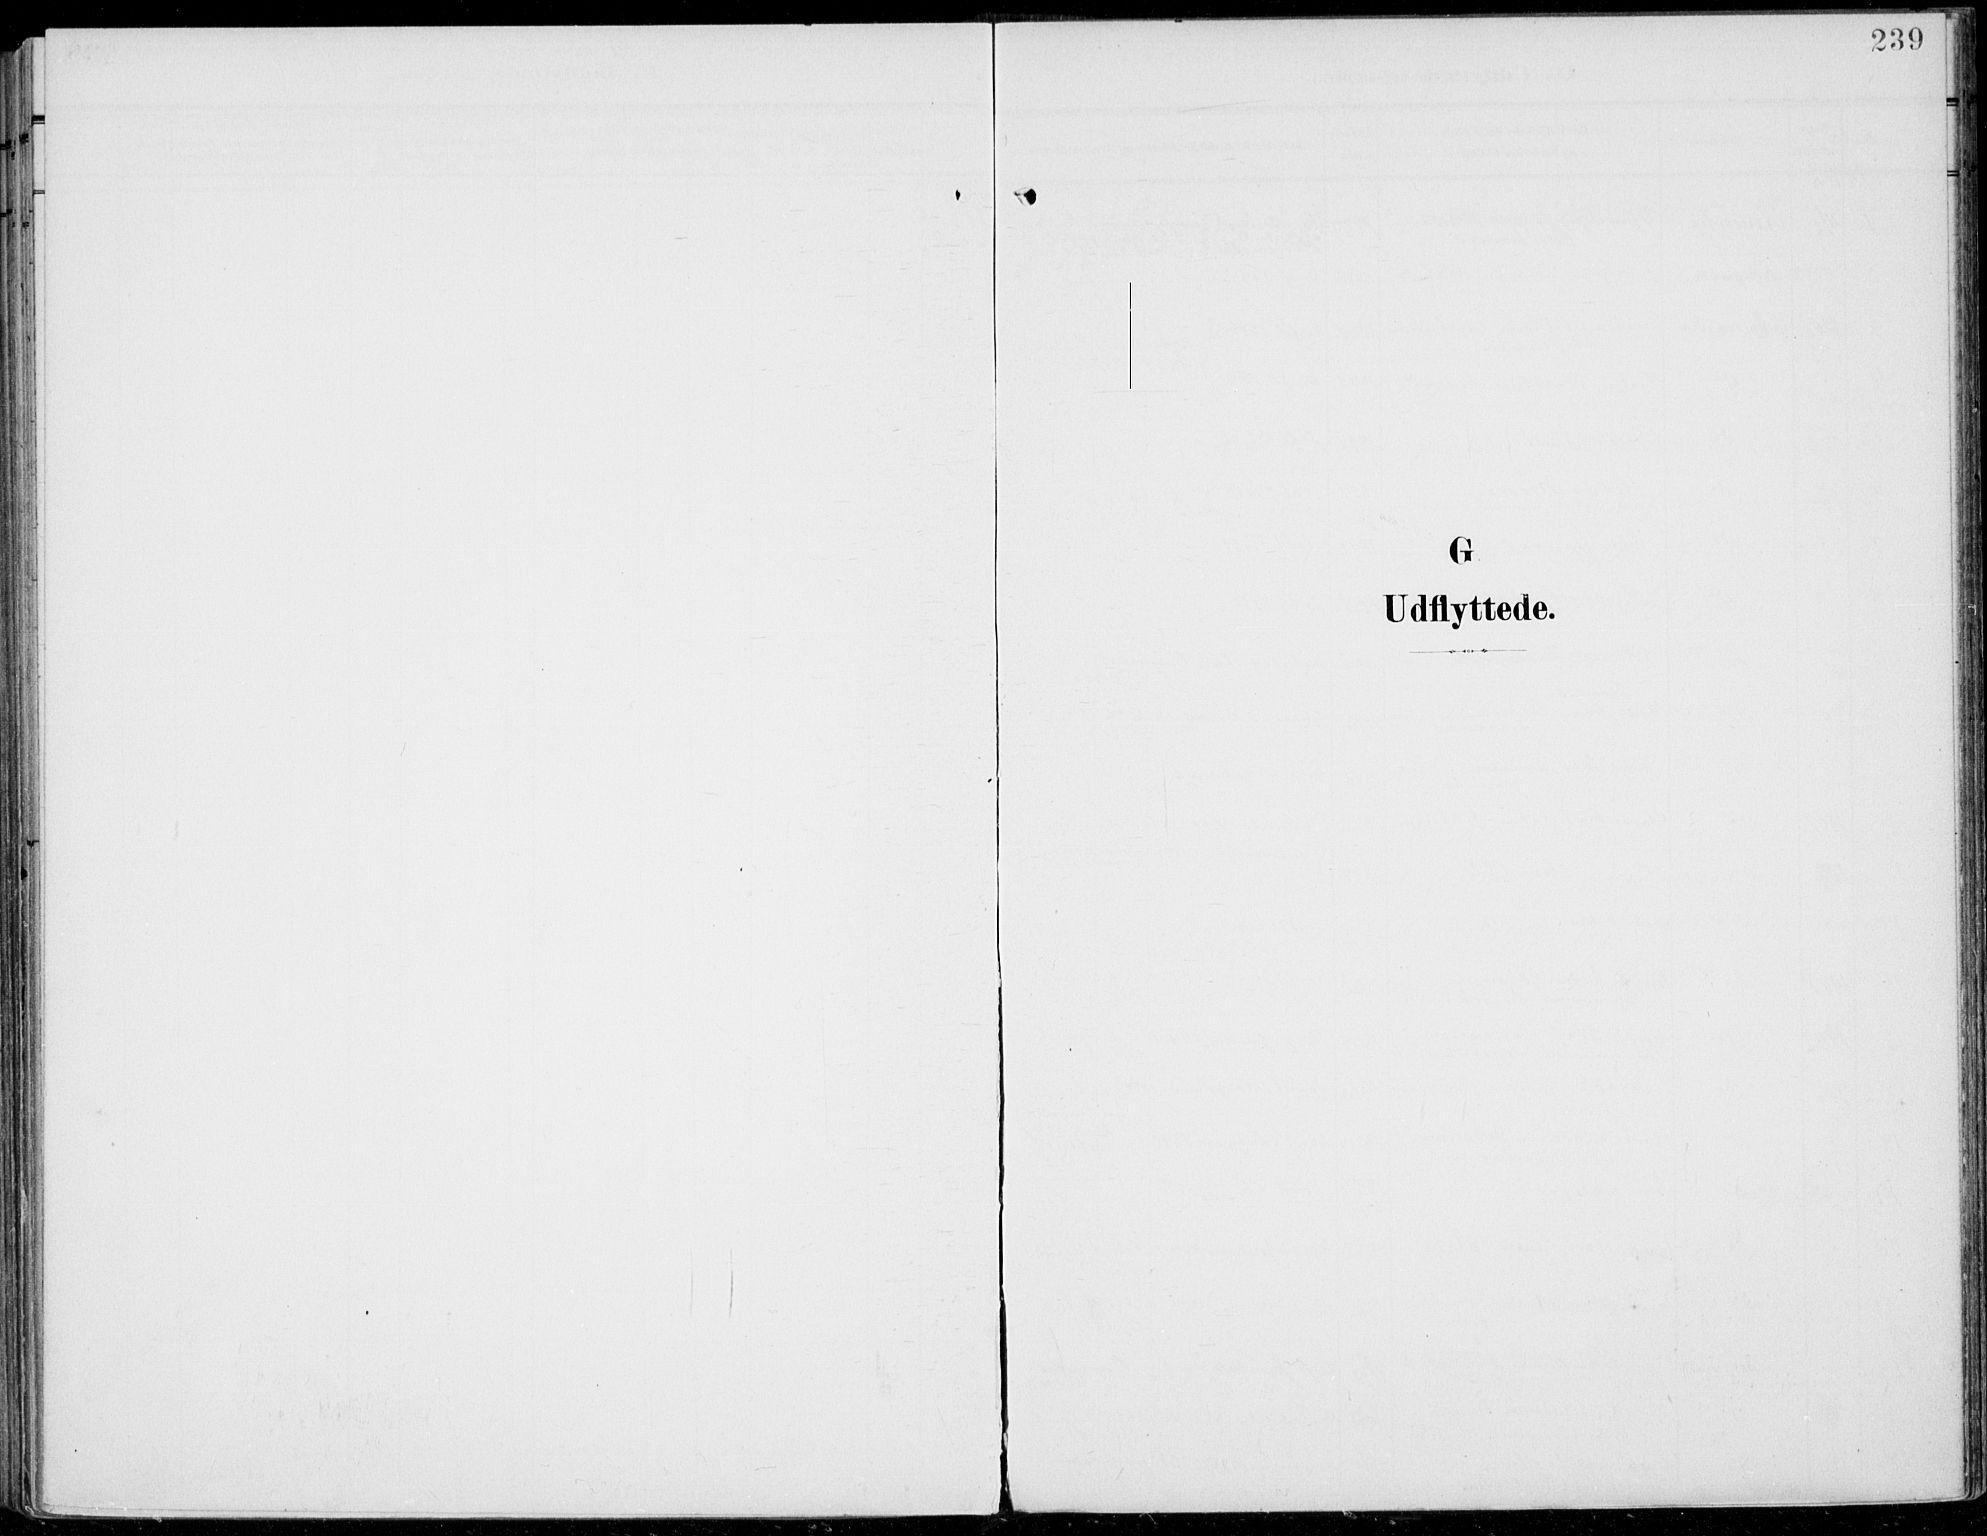 SAH, Jevnaker prestekontor, Ministerialbok nr. 11, 1902-1913, s. 239